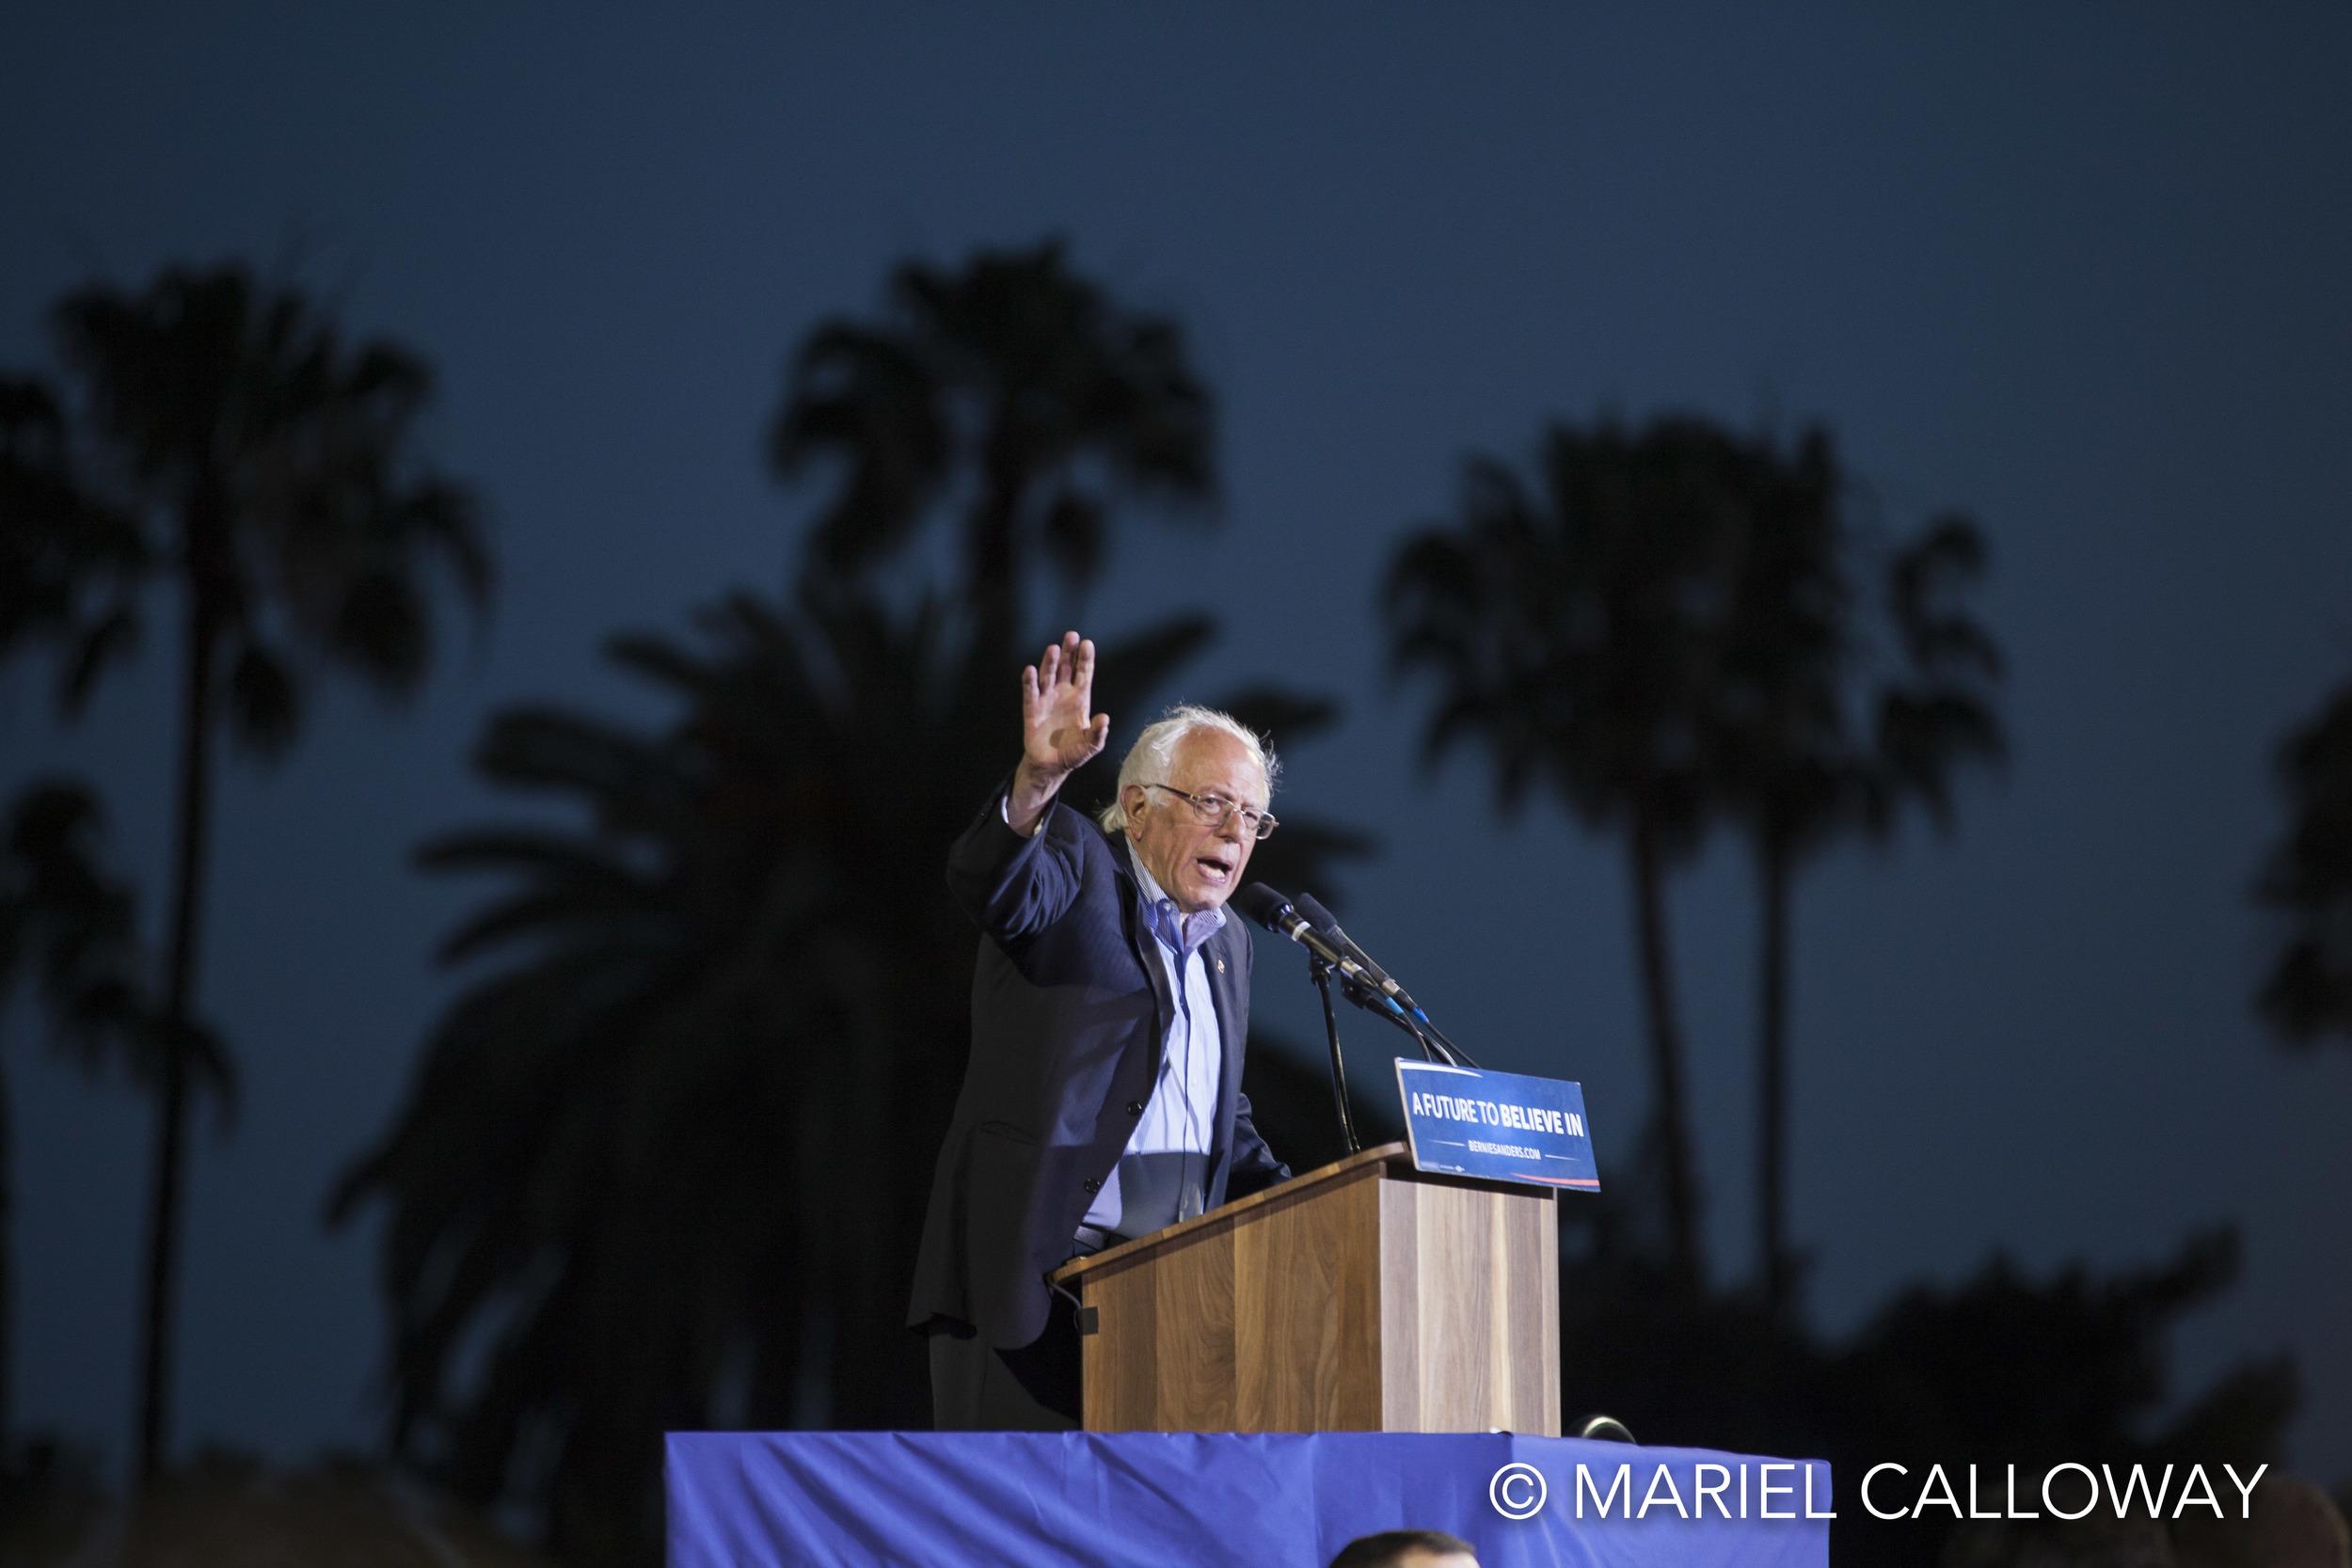 Mariel-Calloway-Bernie-Sanders-Santa-Monica-24.jpg